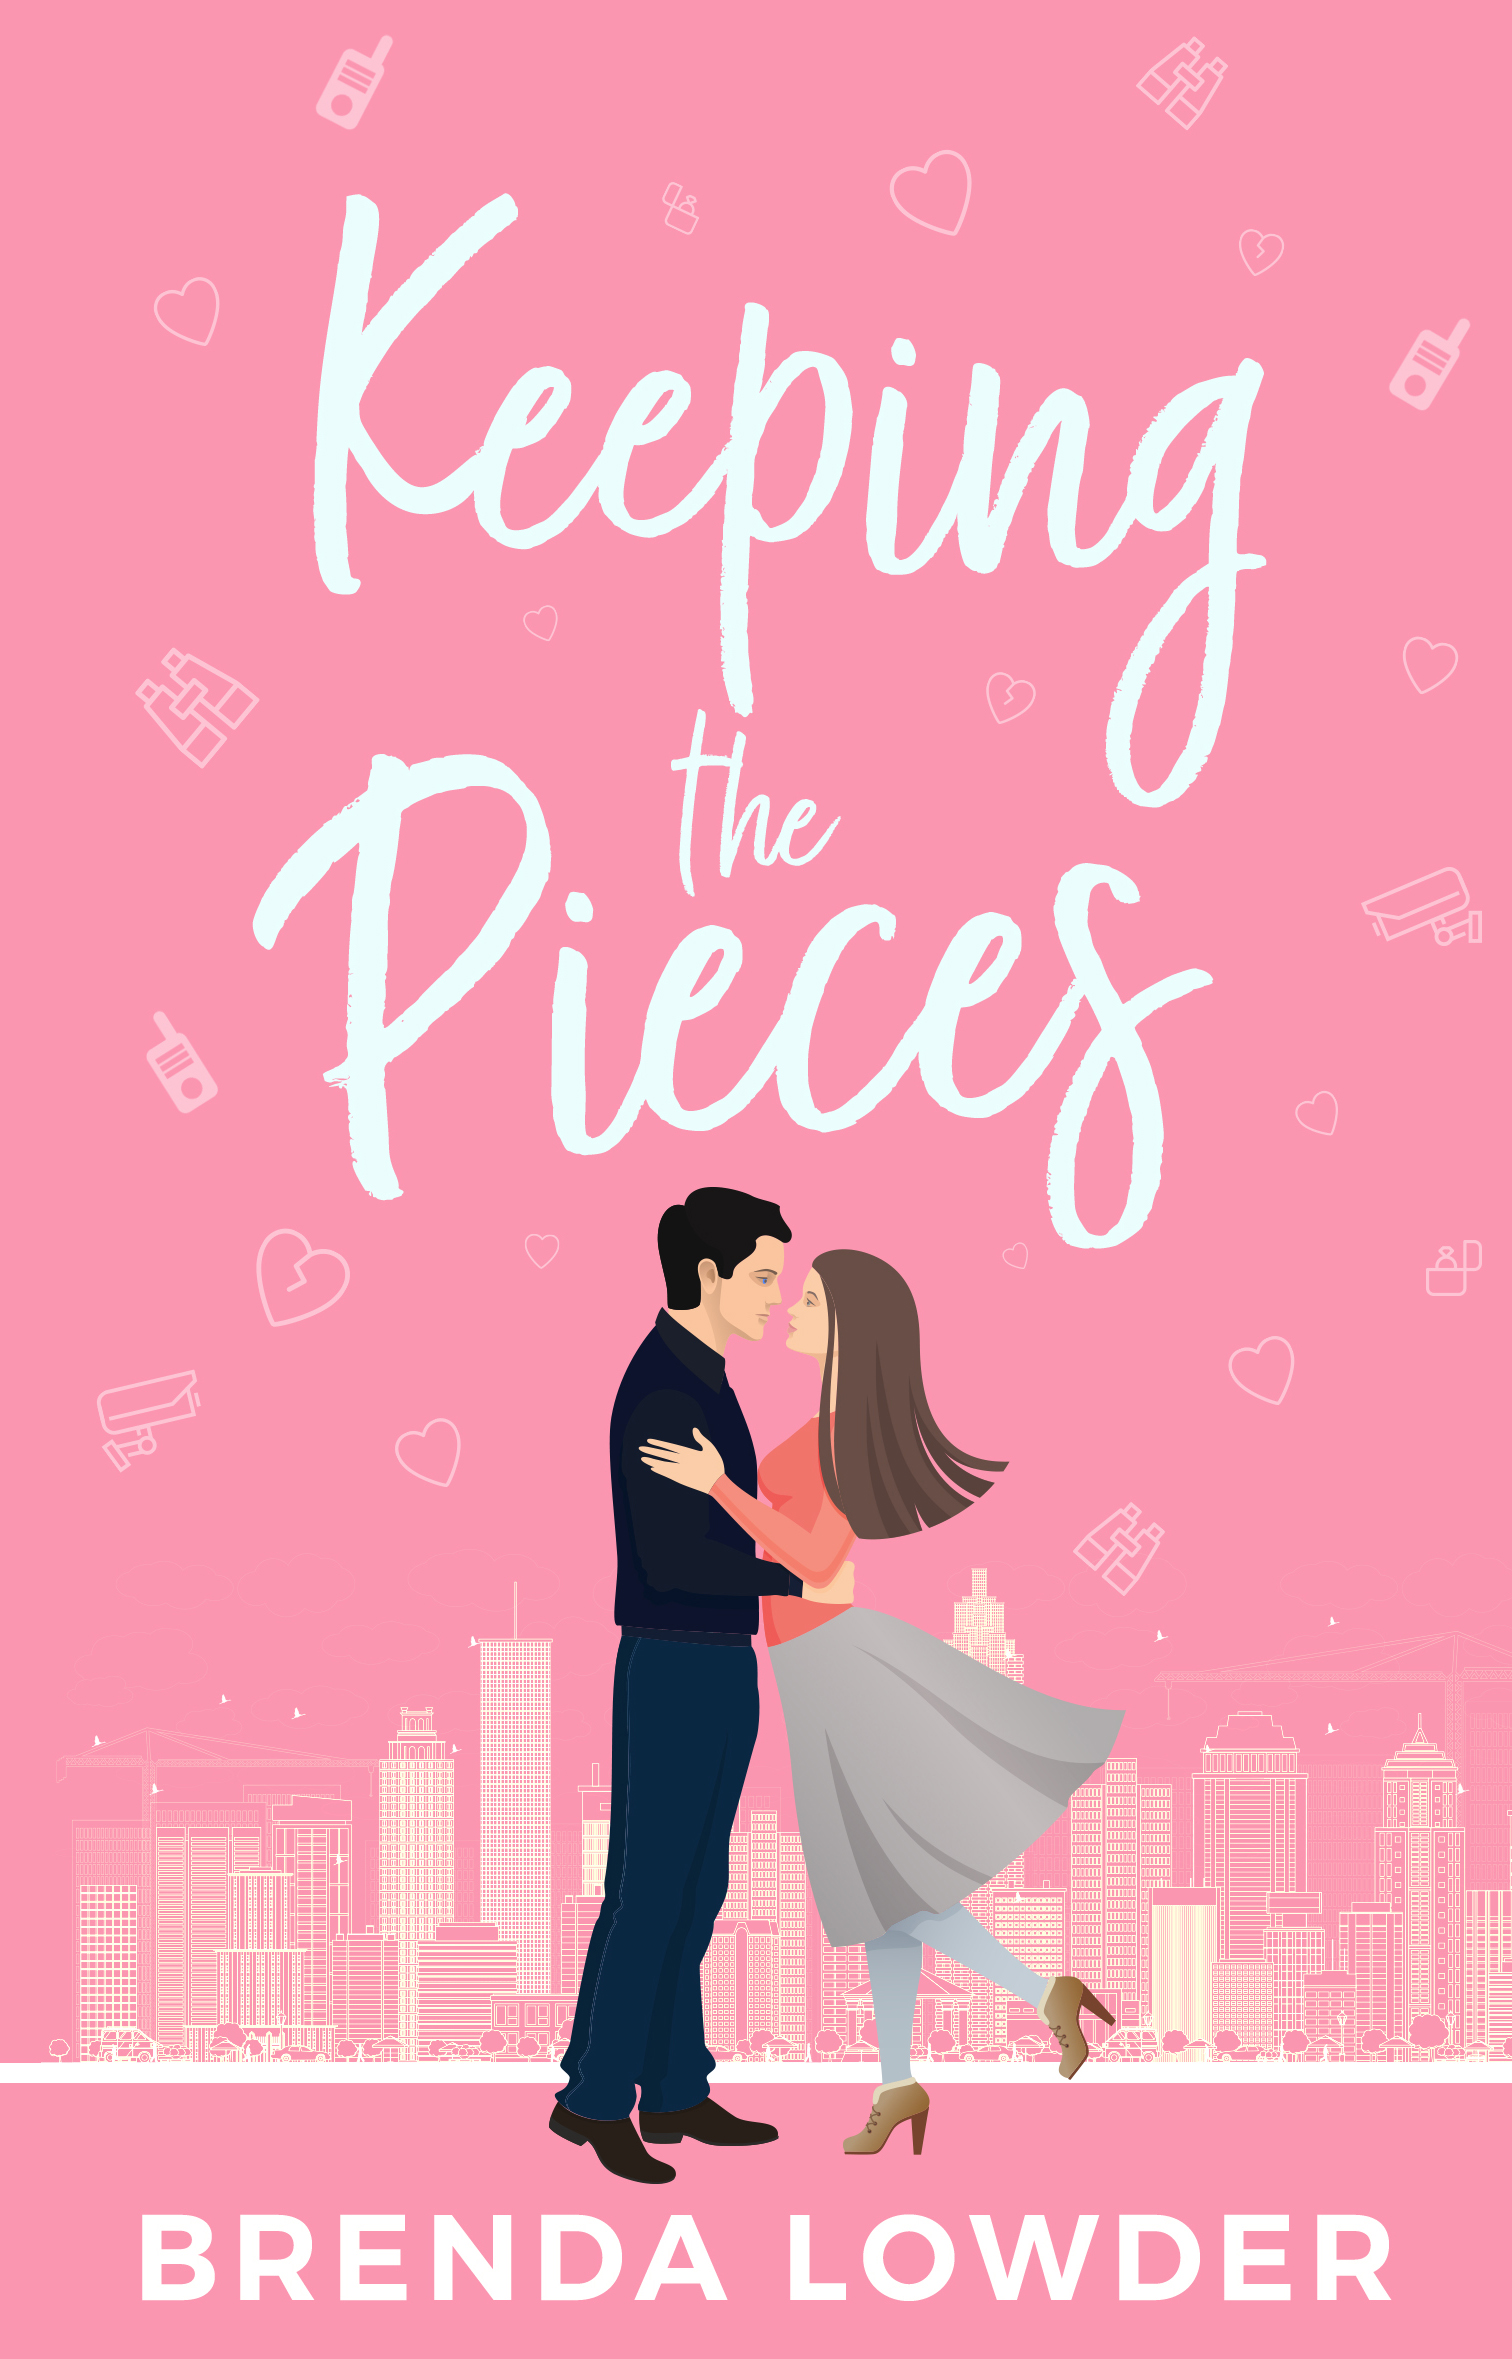 Keeping the Pieces - Brenda Lowder